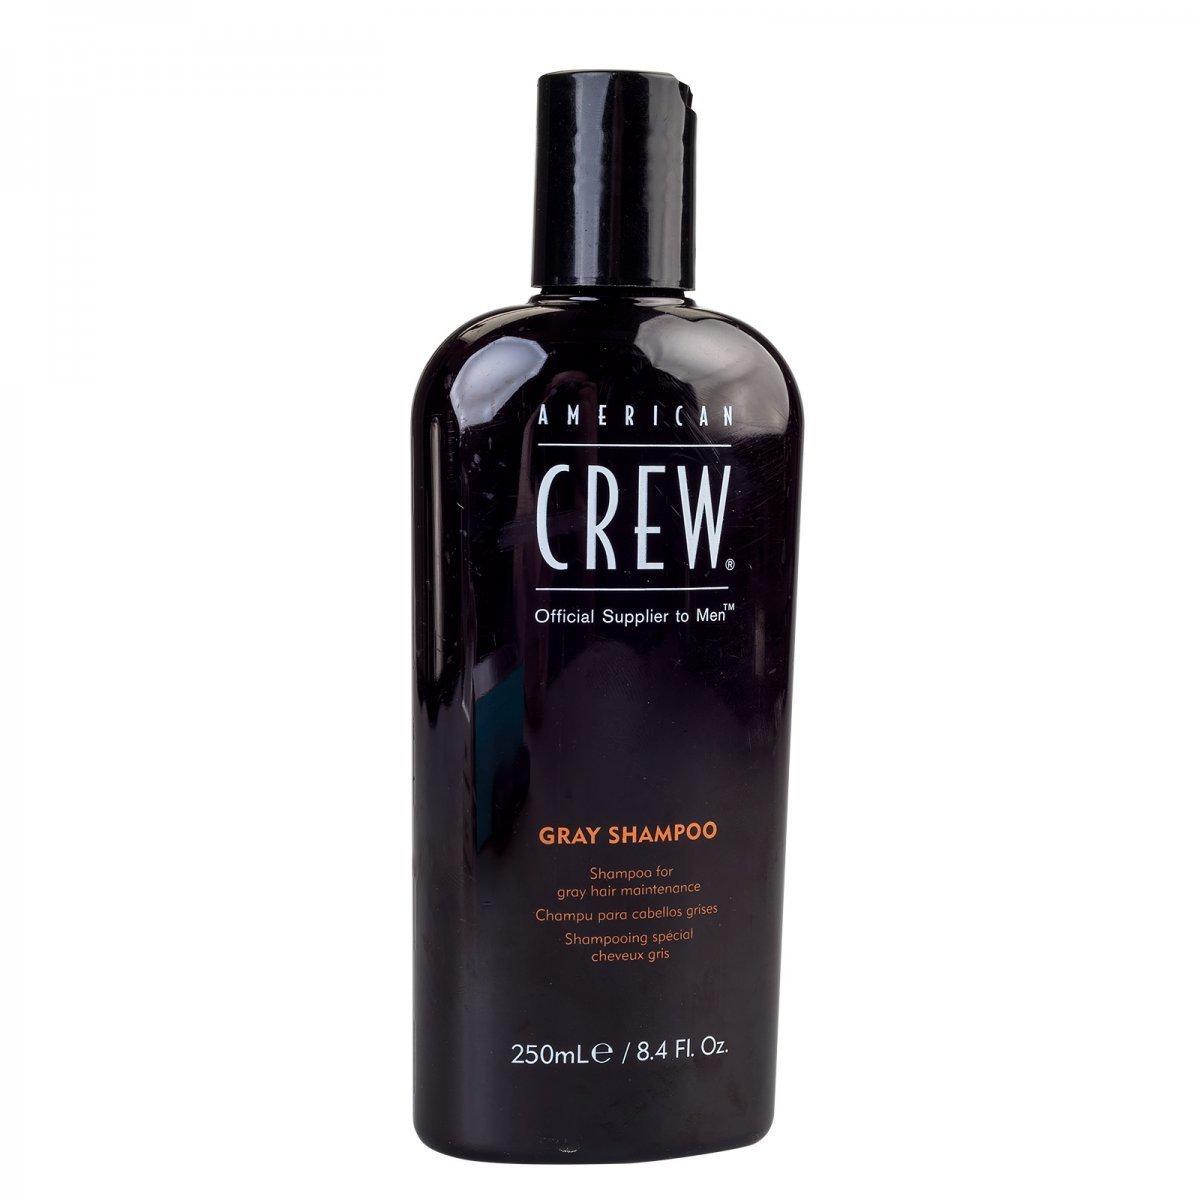 American Crew Classic Gray Shampoo  - Шампунь для седых волос, 250 мл